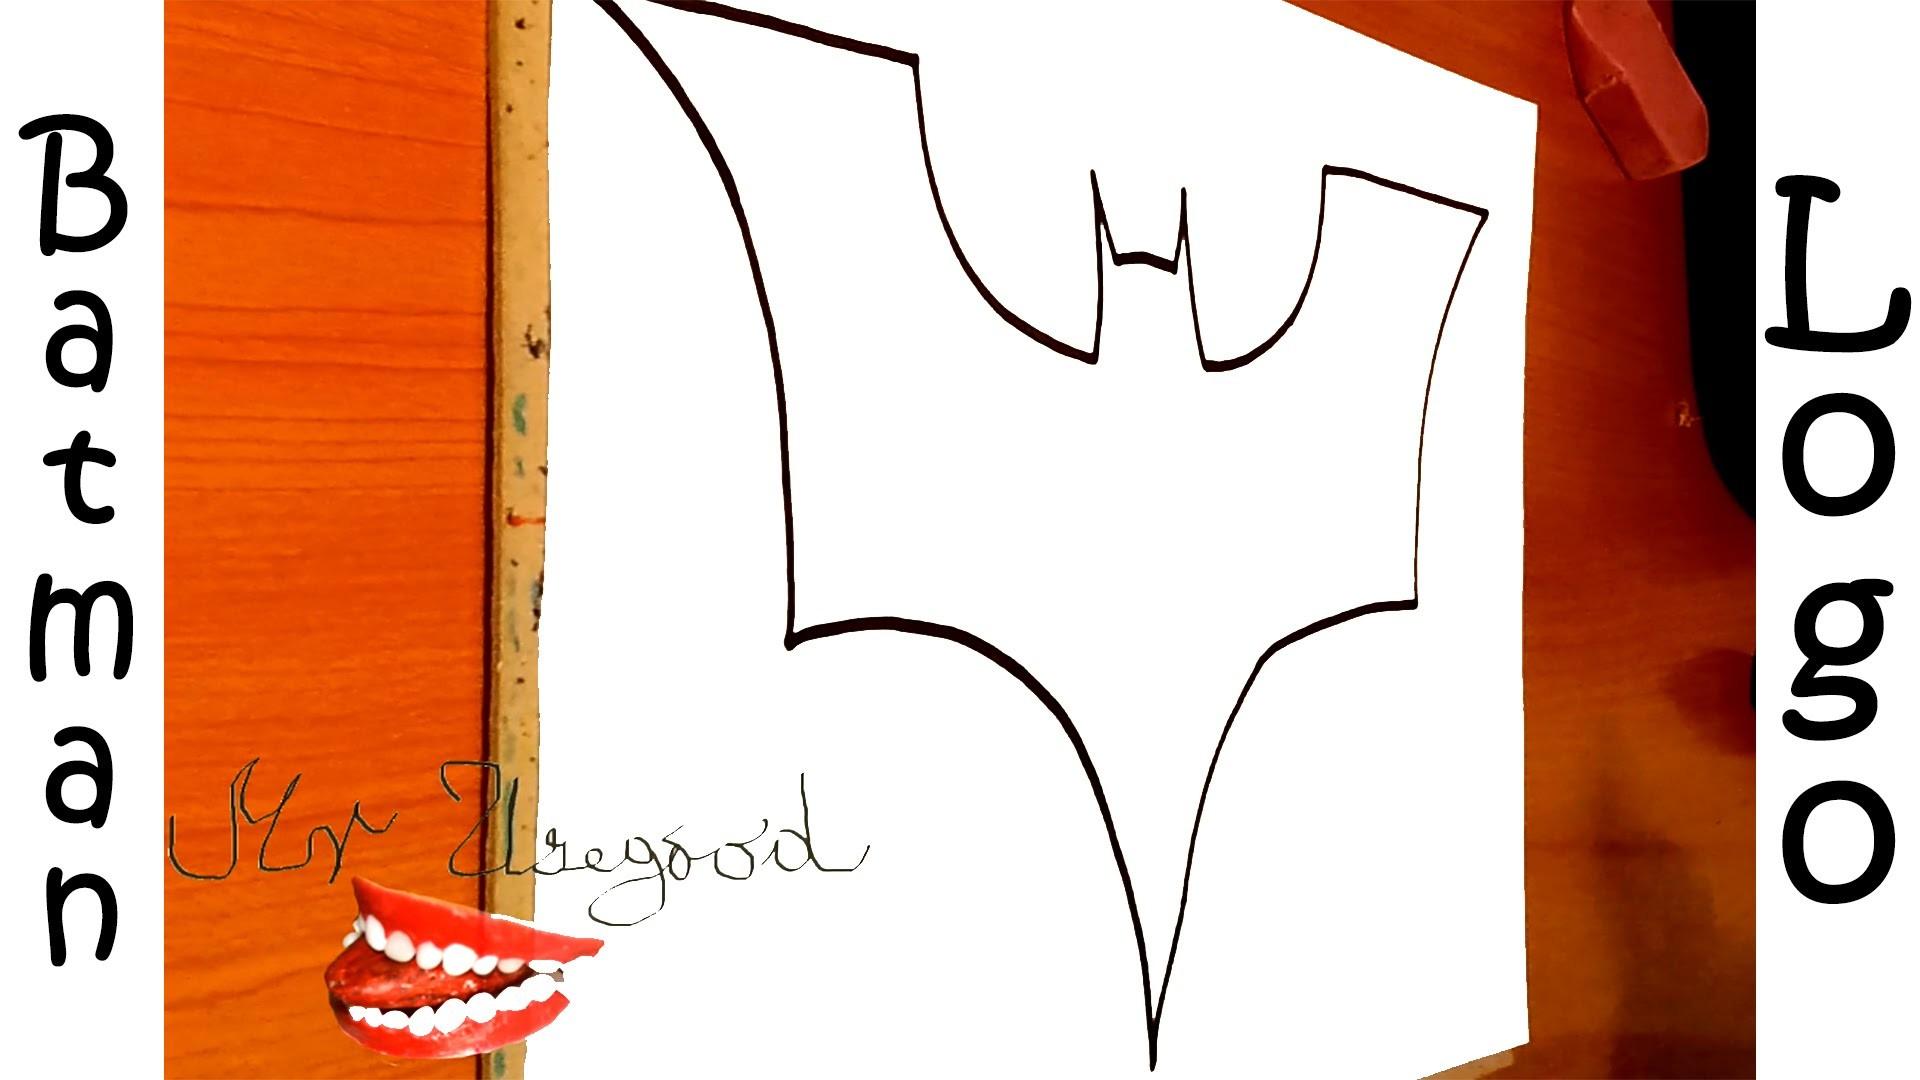 How To Draw Batman Logo Easy Superheroes Logos Draw Easy Stuff But